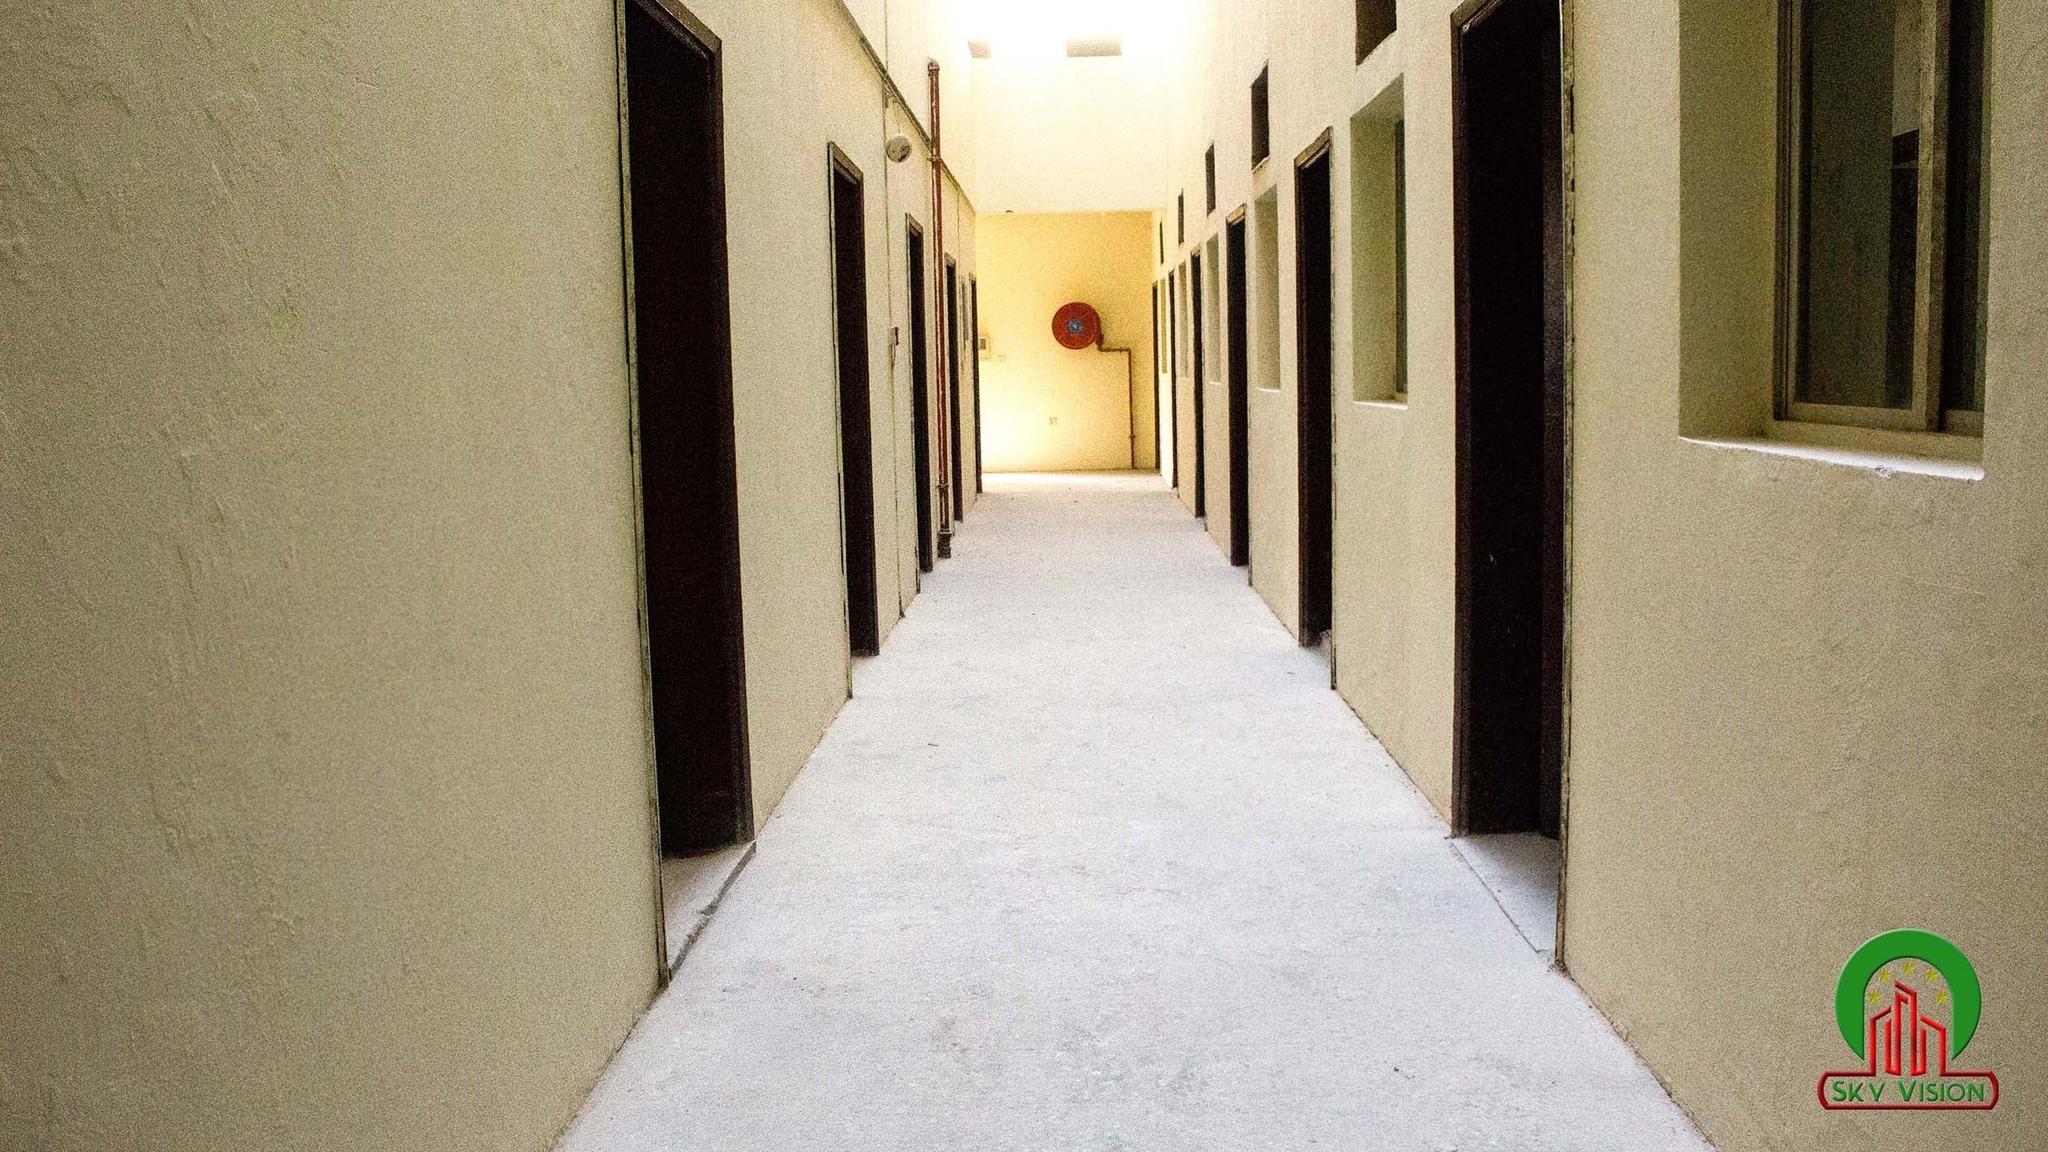 5/10/15/20 UF Labor Rooms | Free Security & Mainat